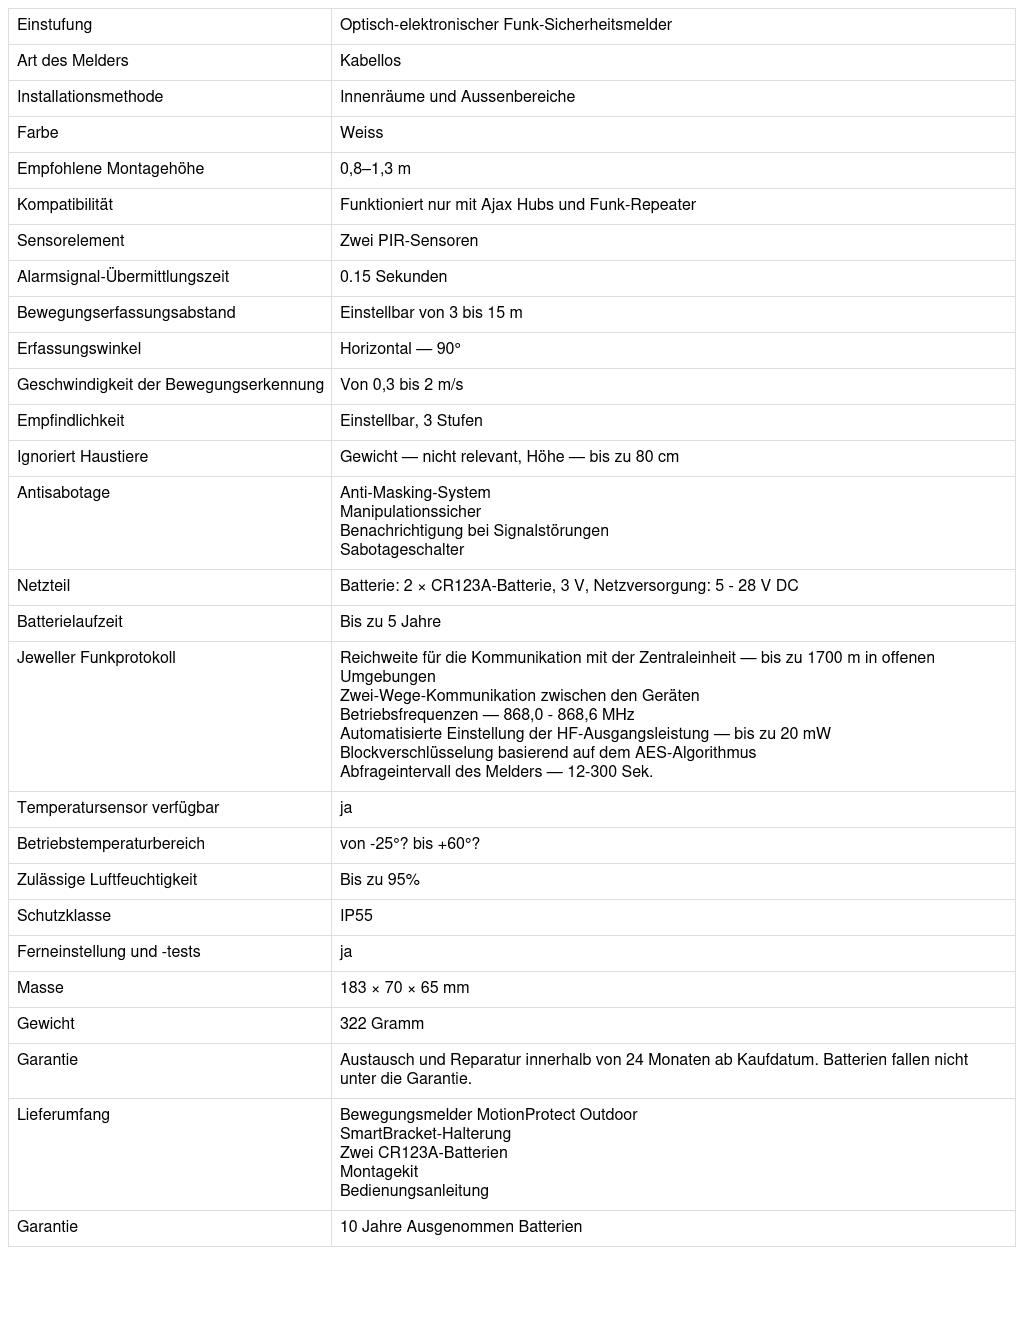 Datenblatt Ajax Aussenbewegungsmelder